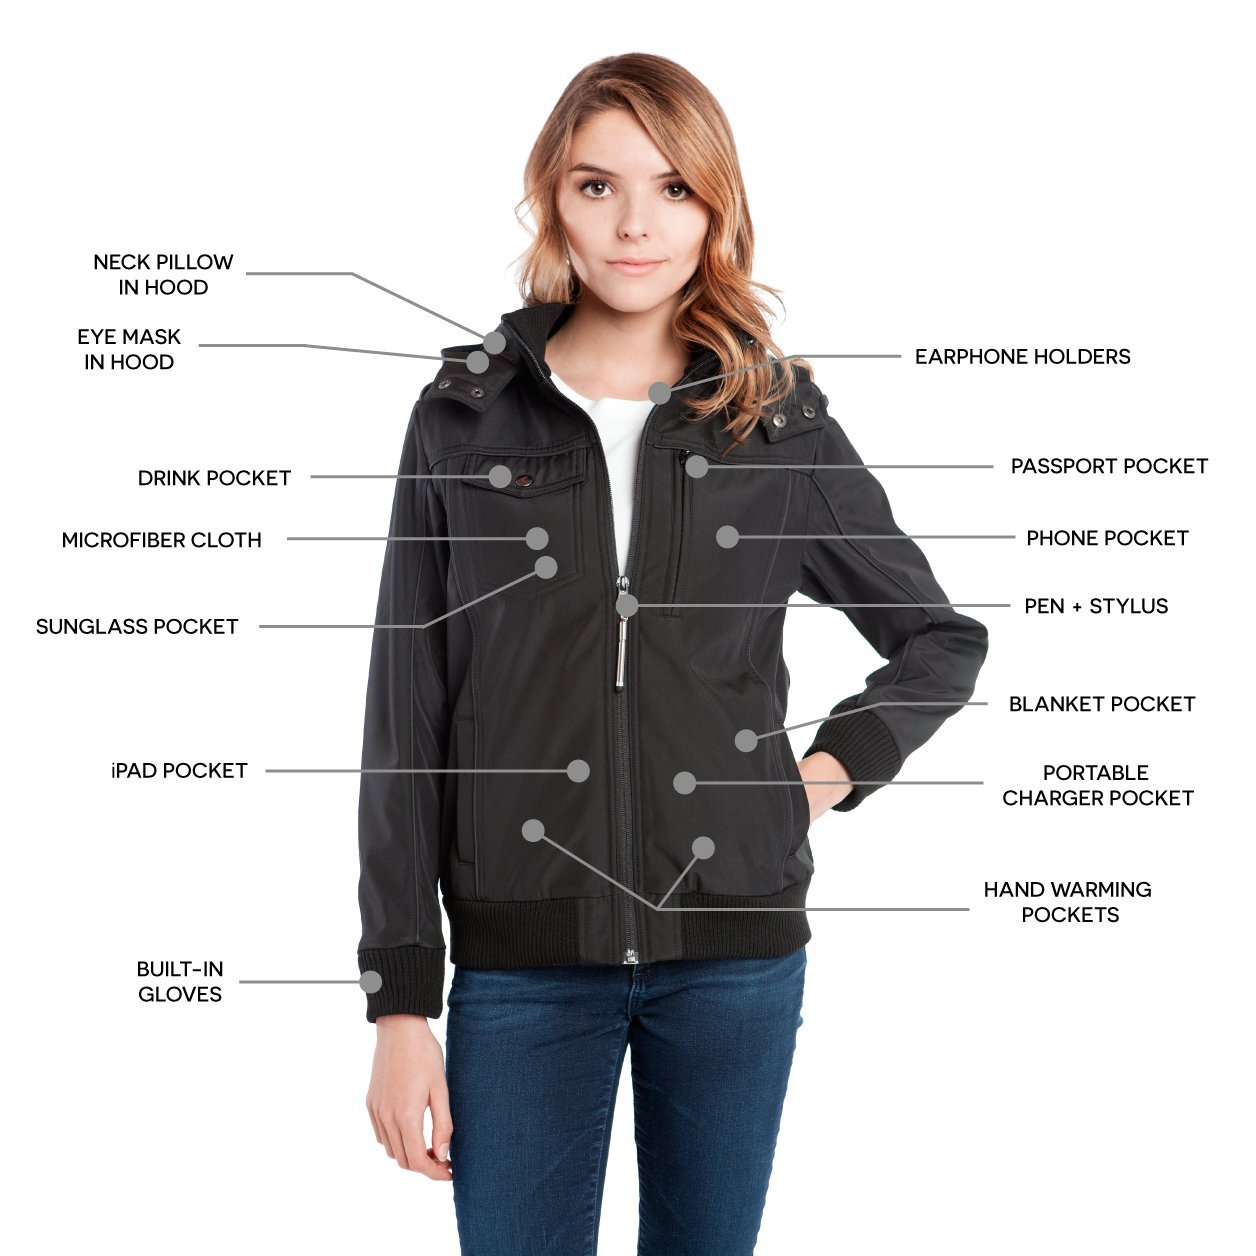 Amazon.com: Baubax Travel Jacket - Bomber - Female - Black - Small ...